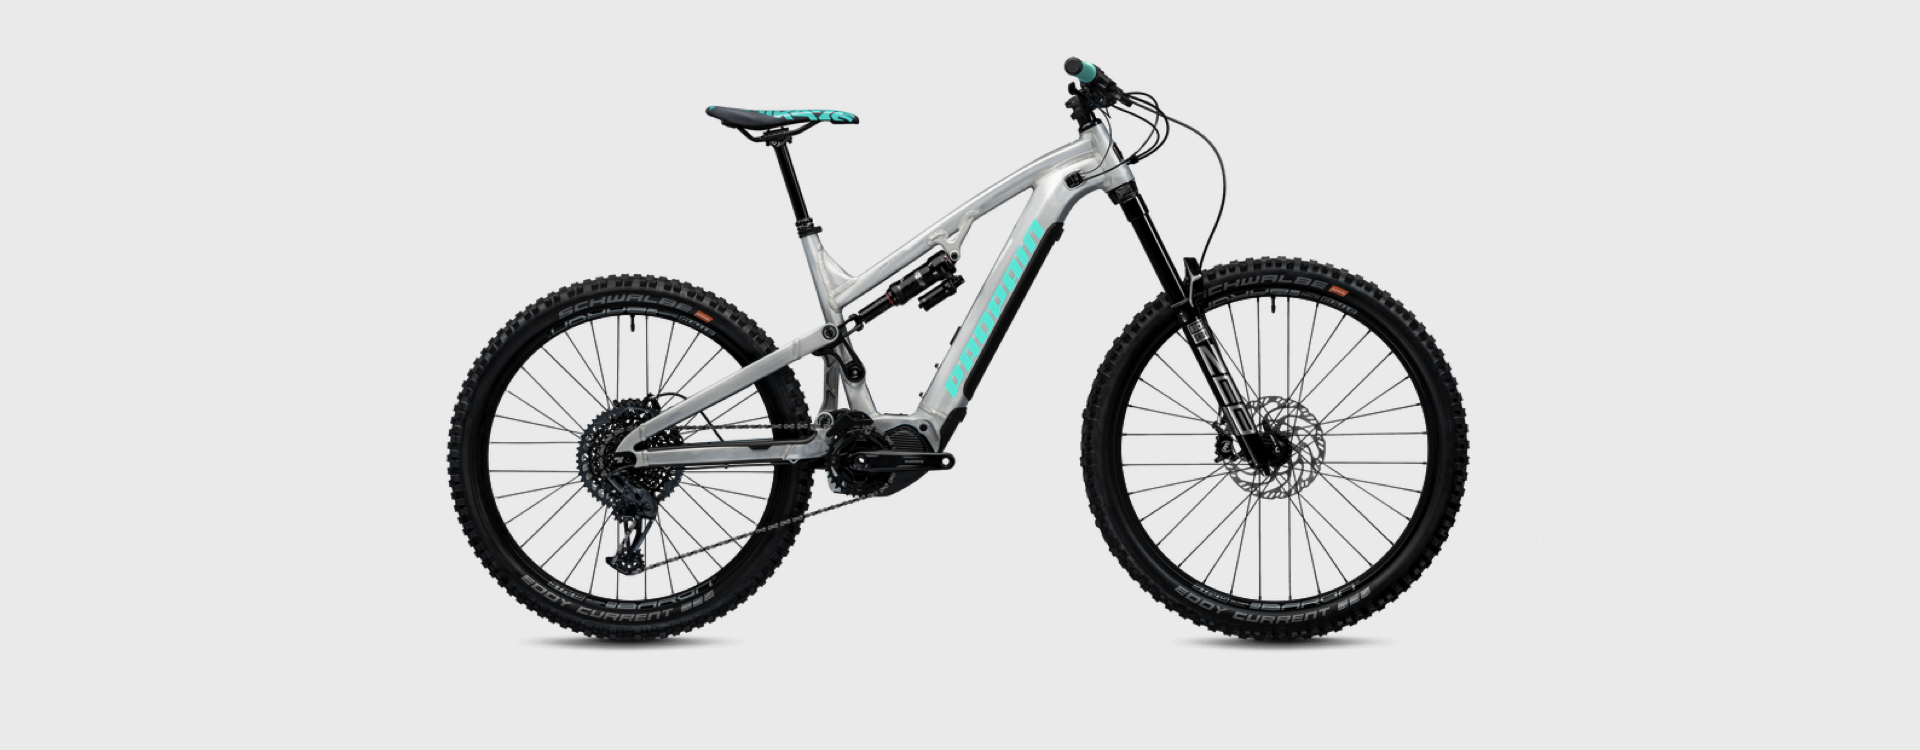 Bike Verleih Gummersbach Propain Bikes Testcenter NRW Ekano 7 - AL - L - Mix - Raw - 1920x750